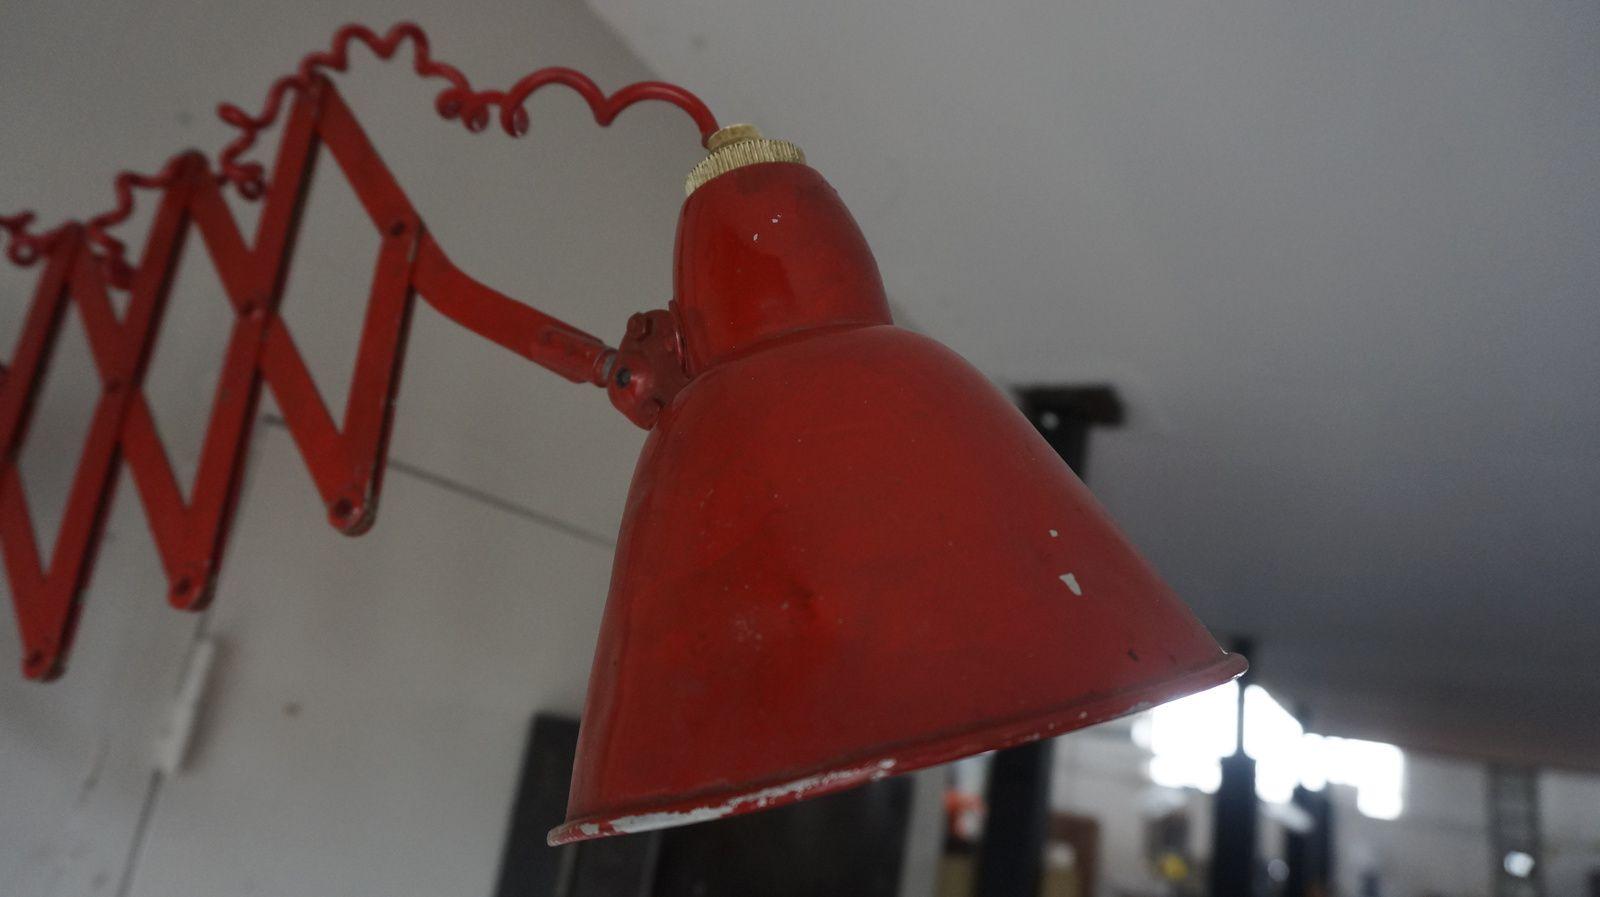 LAMPE ACCORDEON